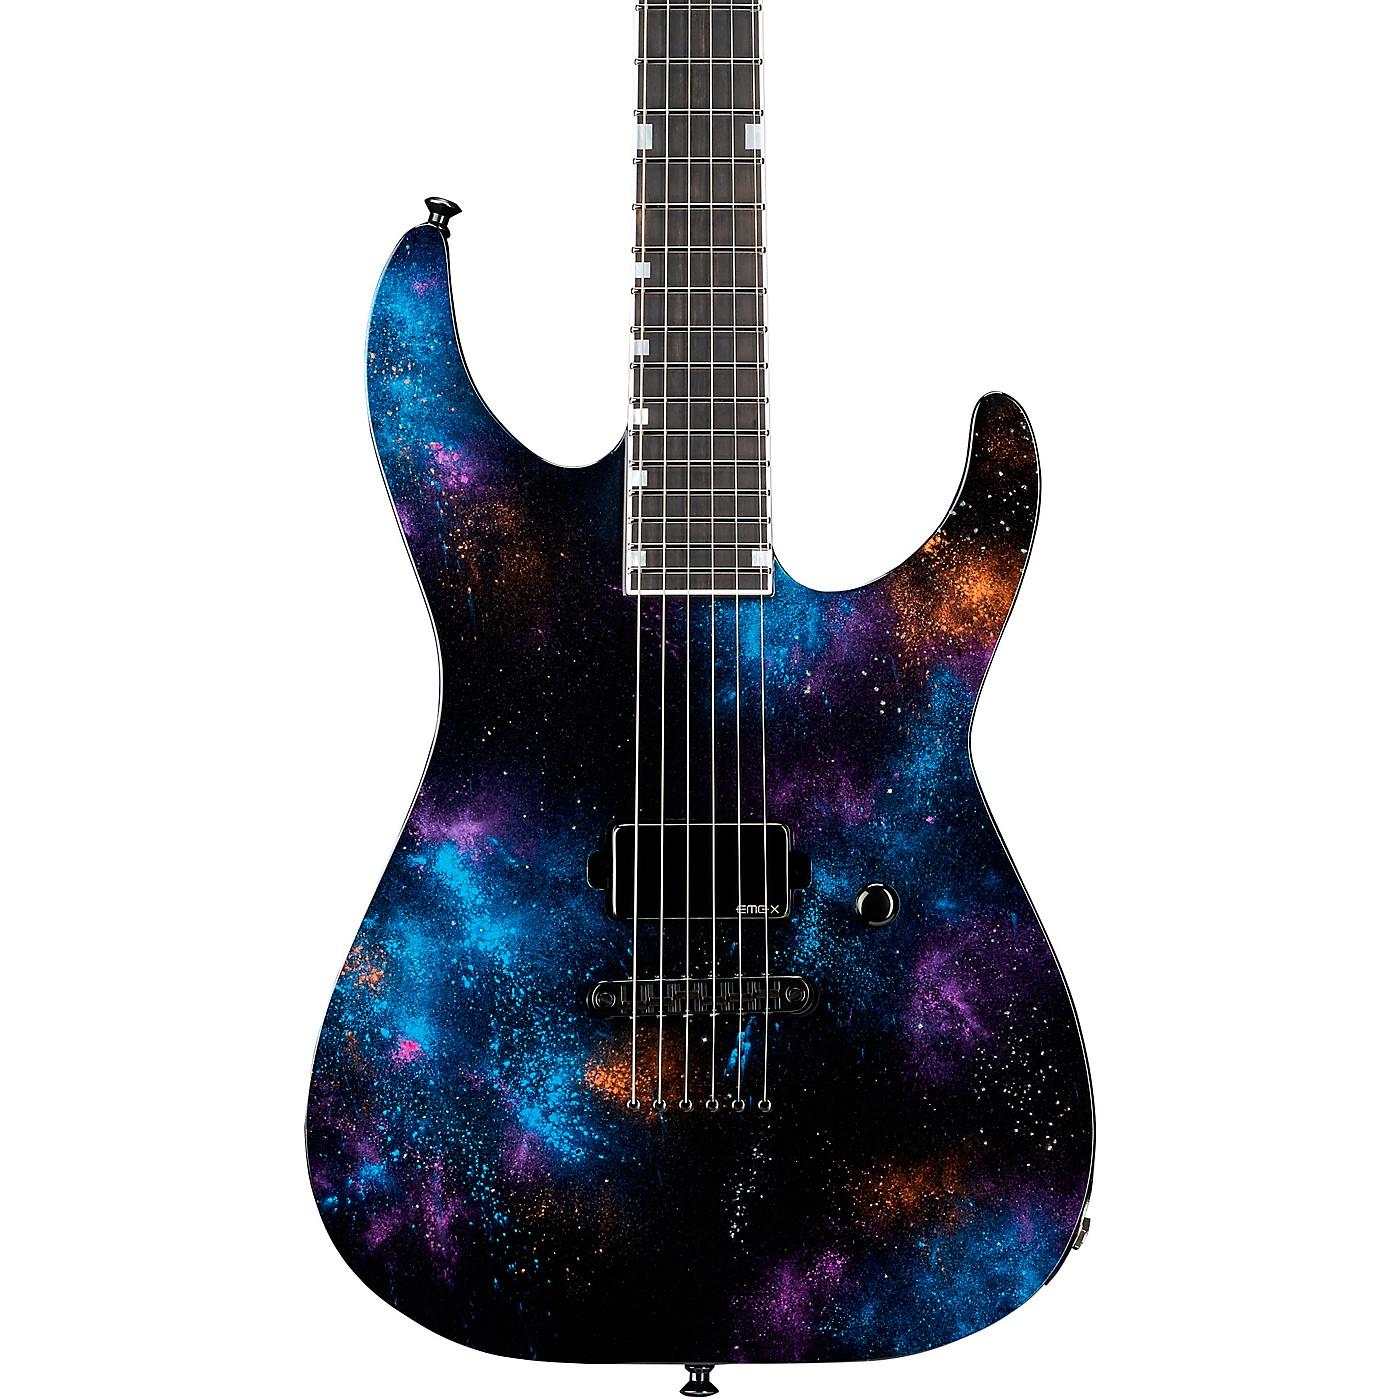 ESP USA M-I NTB Cosmos Limited Edition Electric Guitar thumbnail